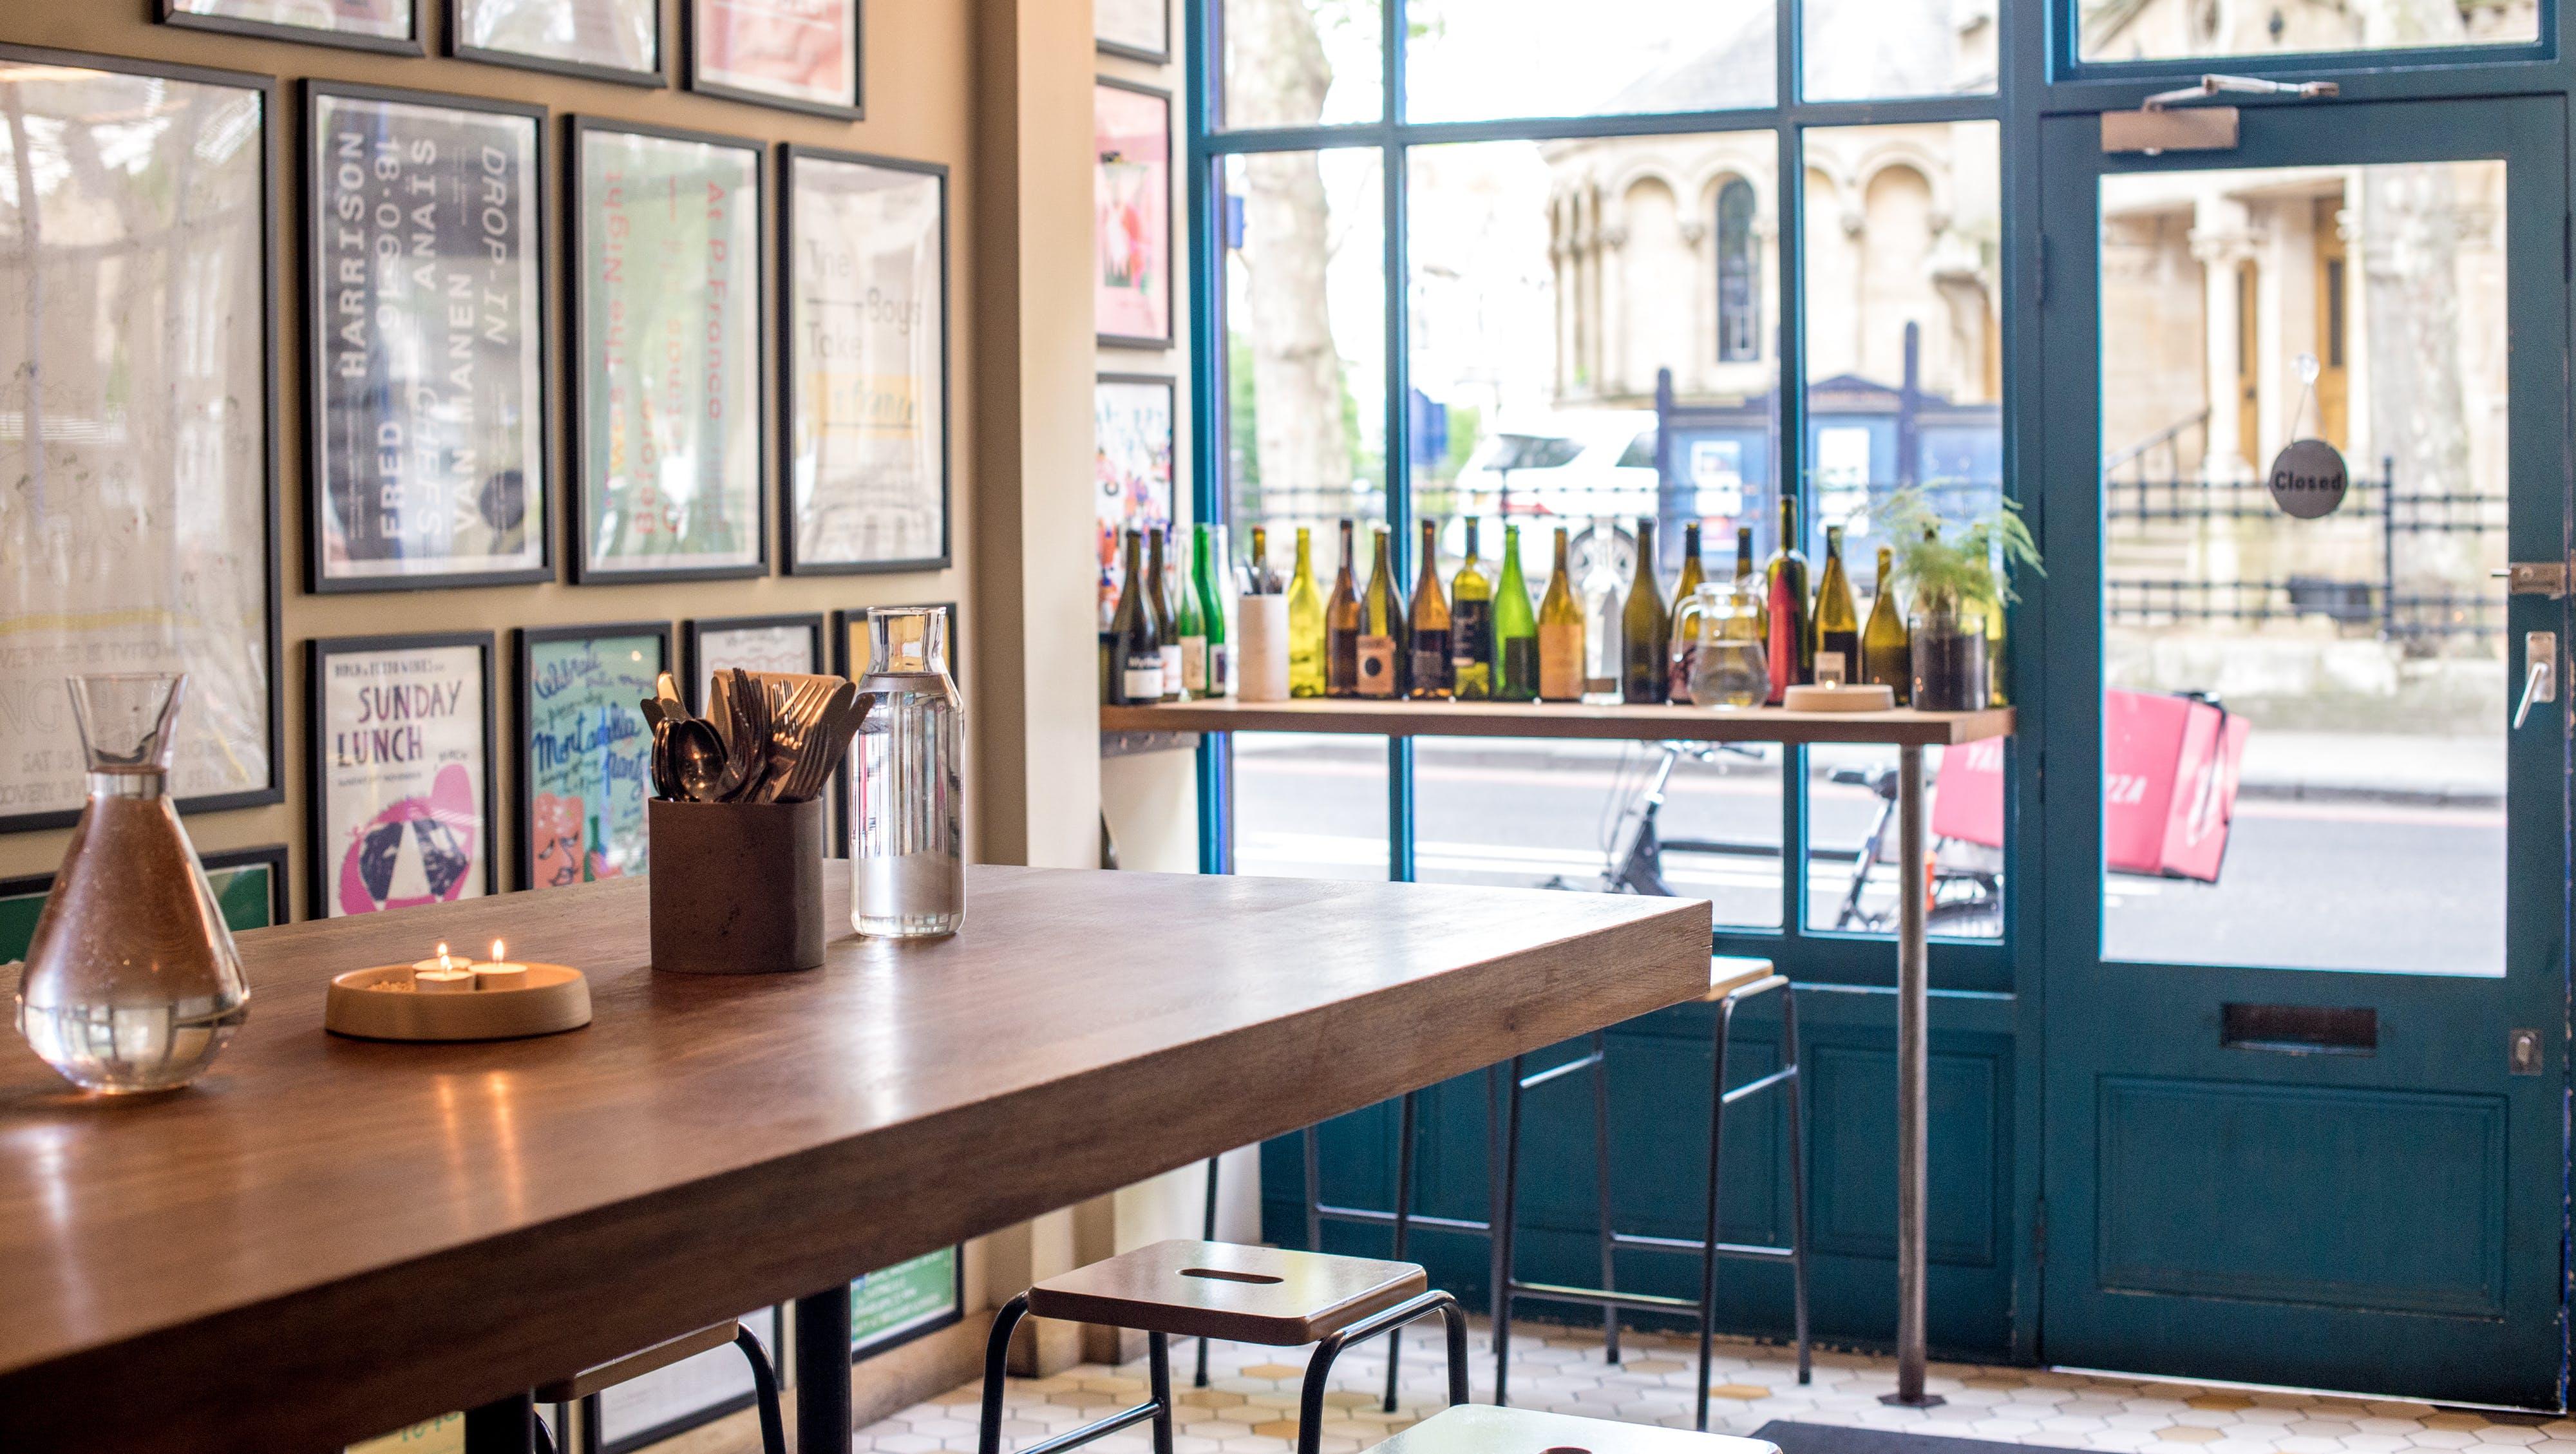 Date night restaurants london ontario